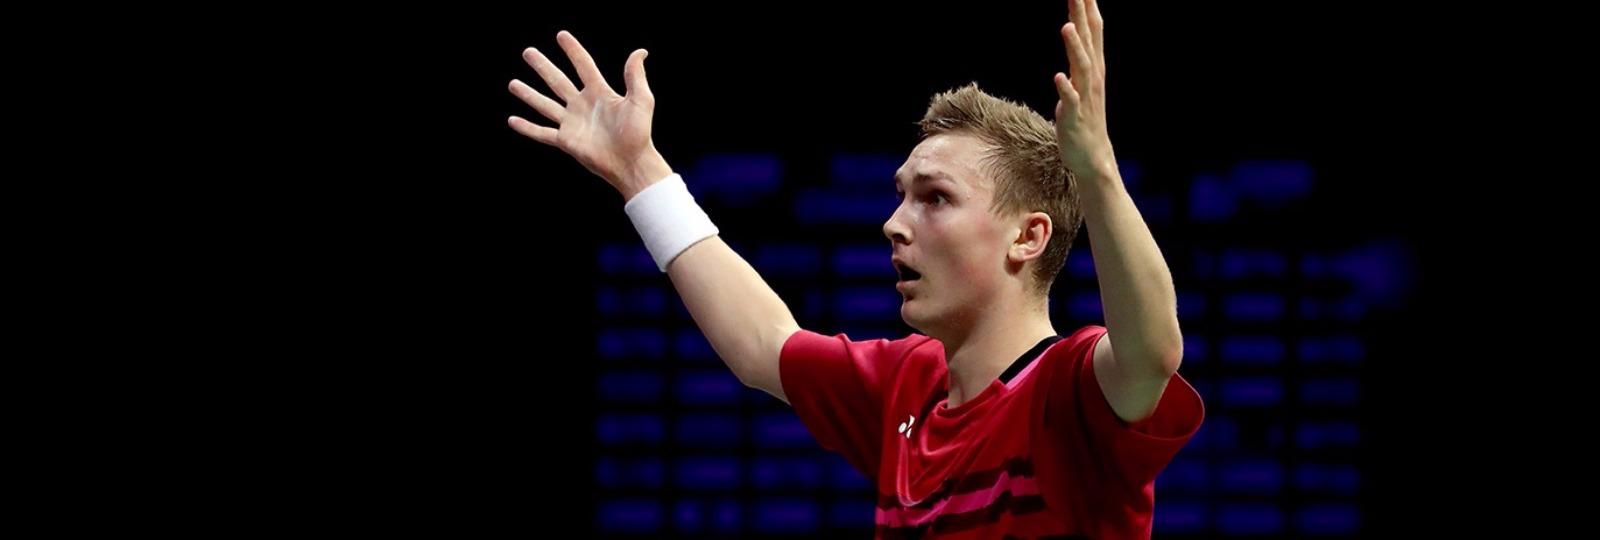 Viktor Axelsen, world champion   (c) Badminton Photo